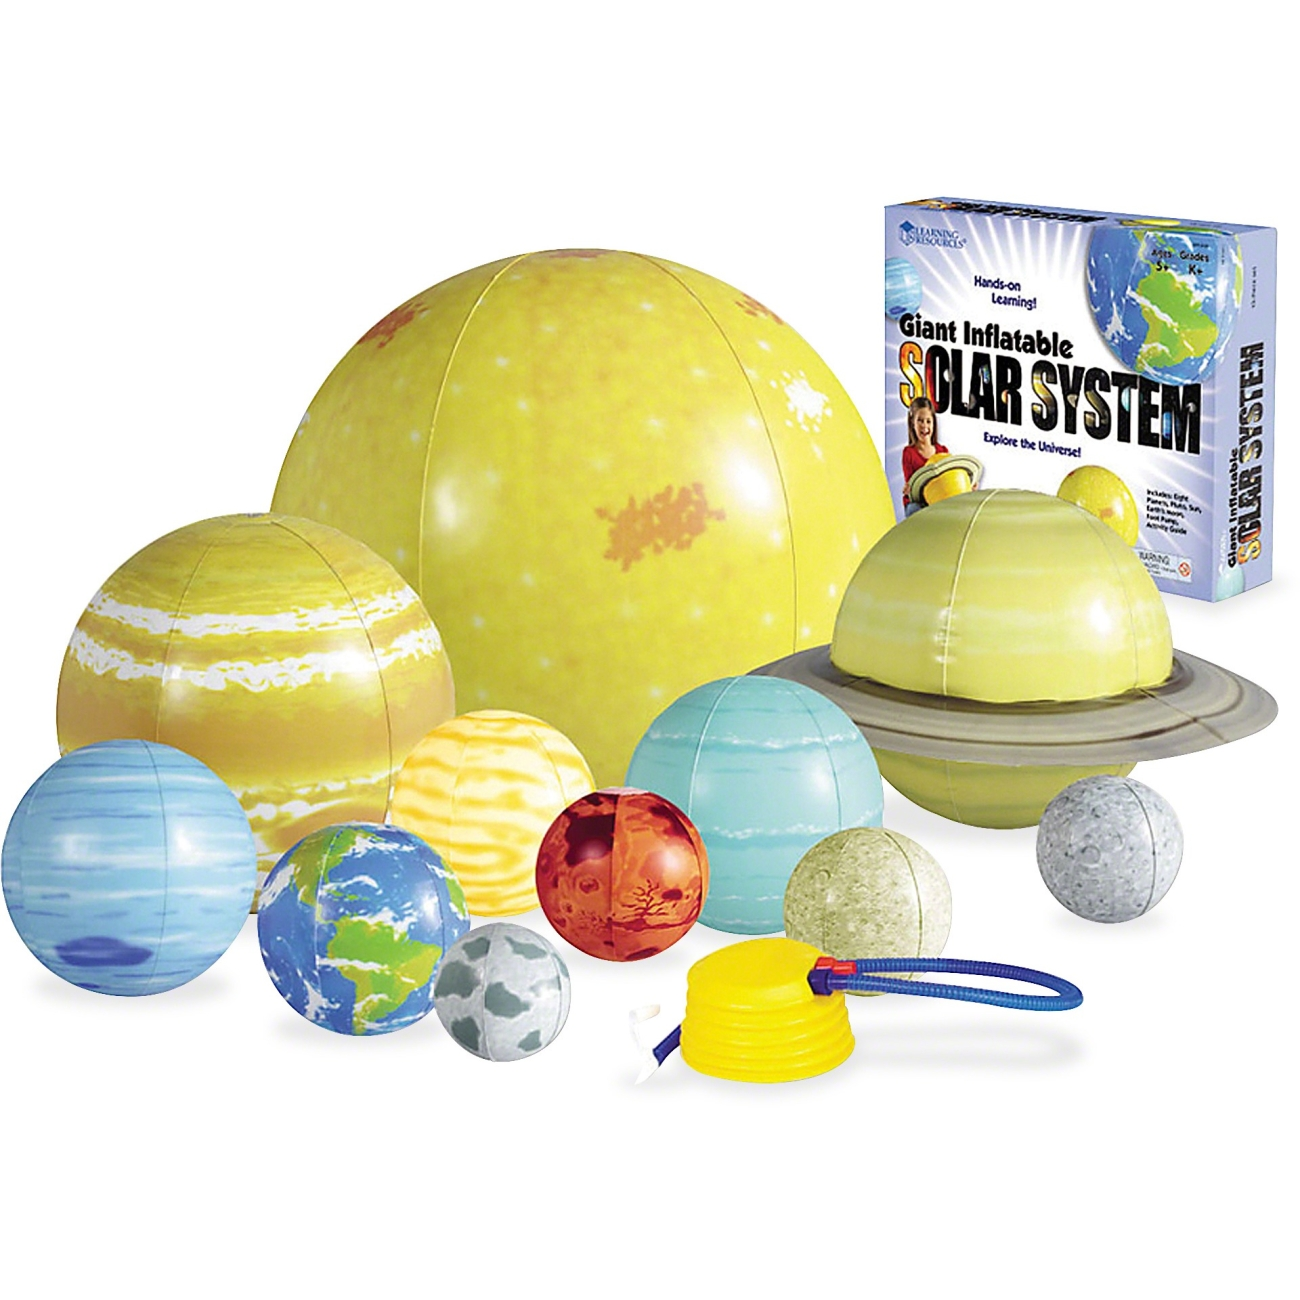 giant solar system model - photo #5